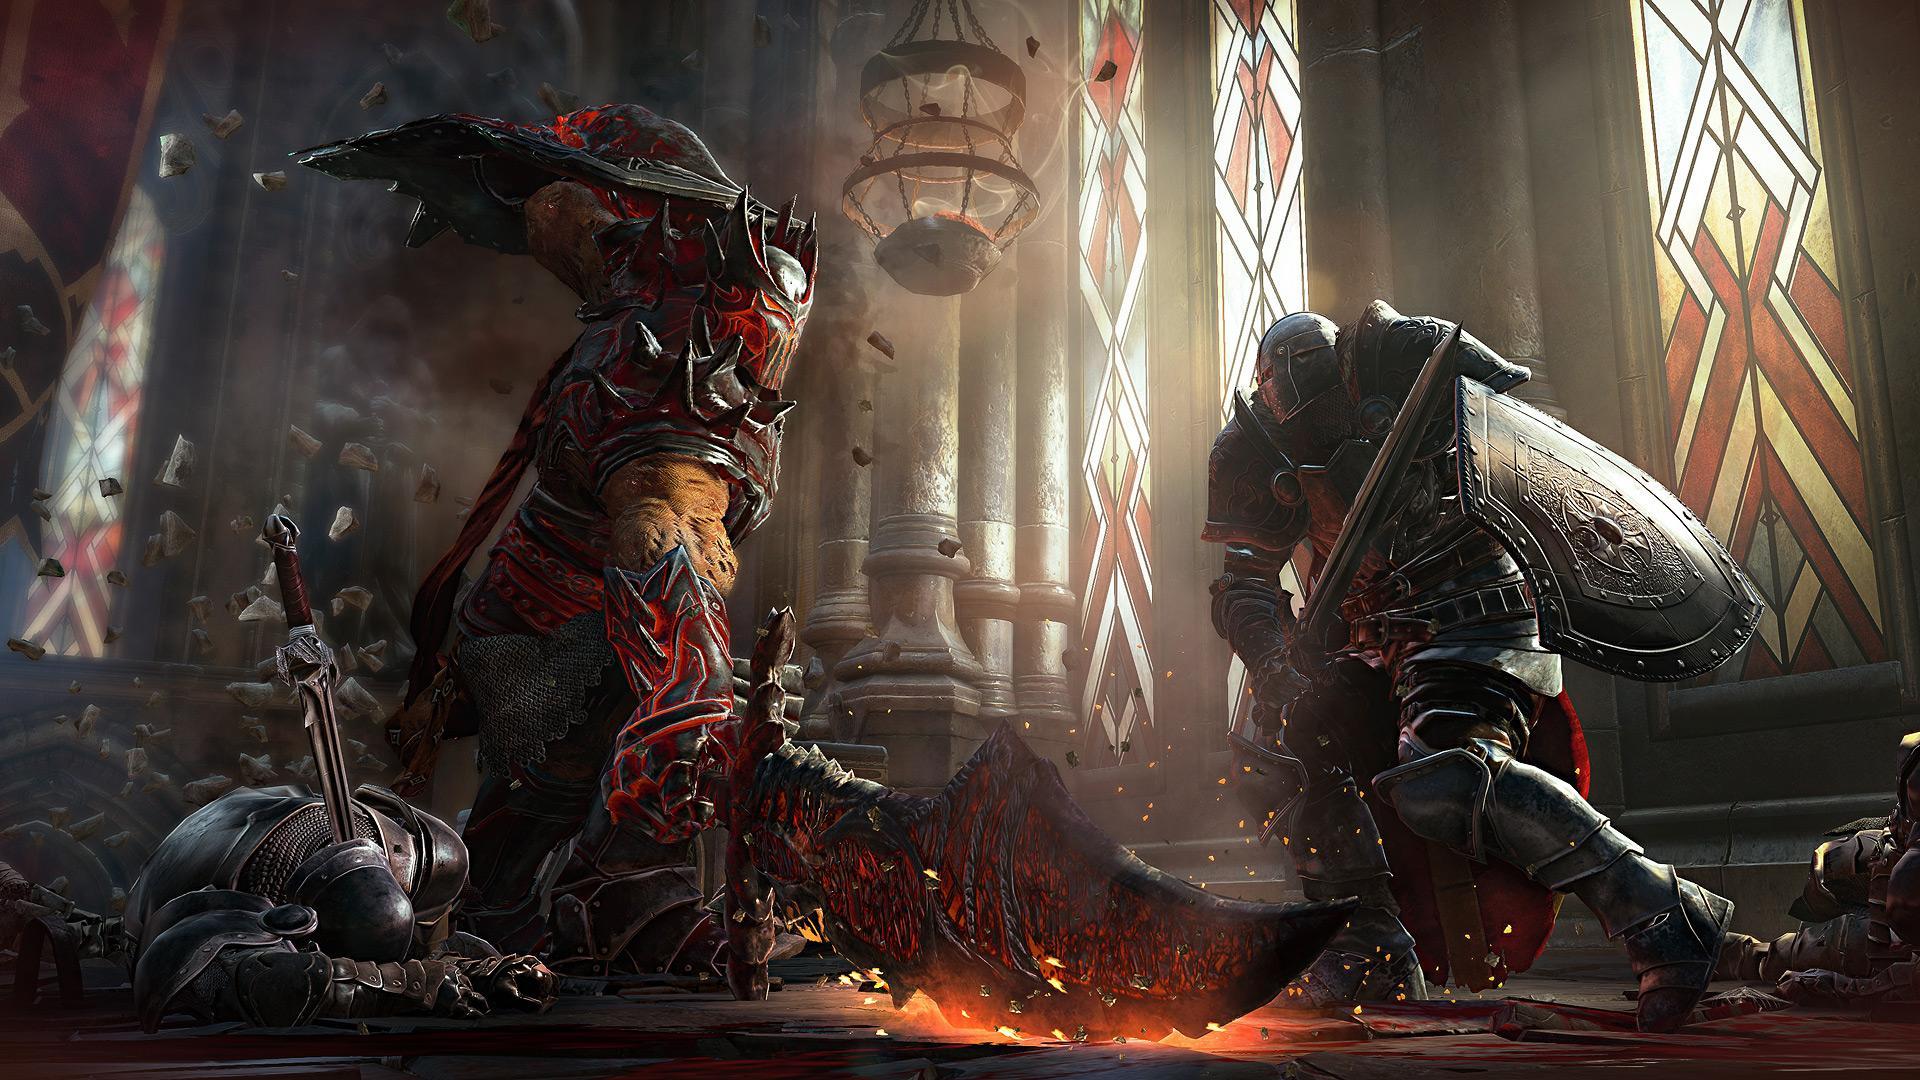 CI Games založilo nové studio HexWorks, to se postará o vývoj Lords of the Fallen 2